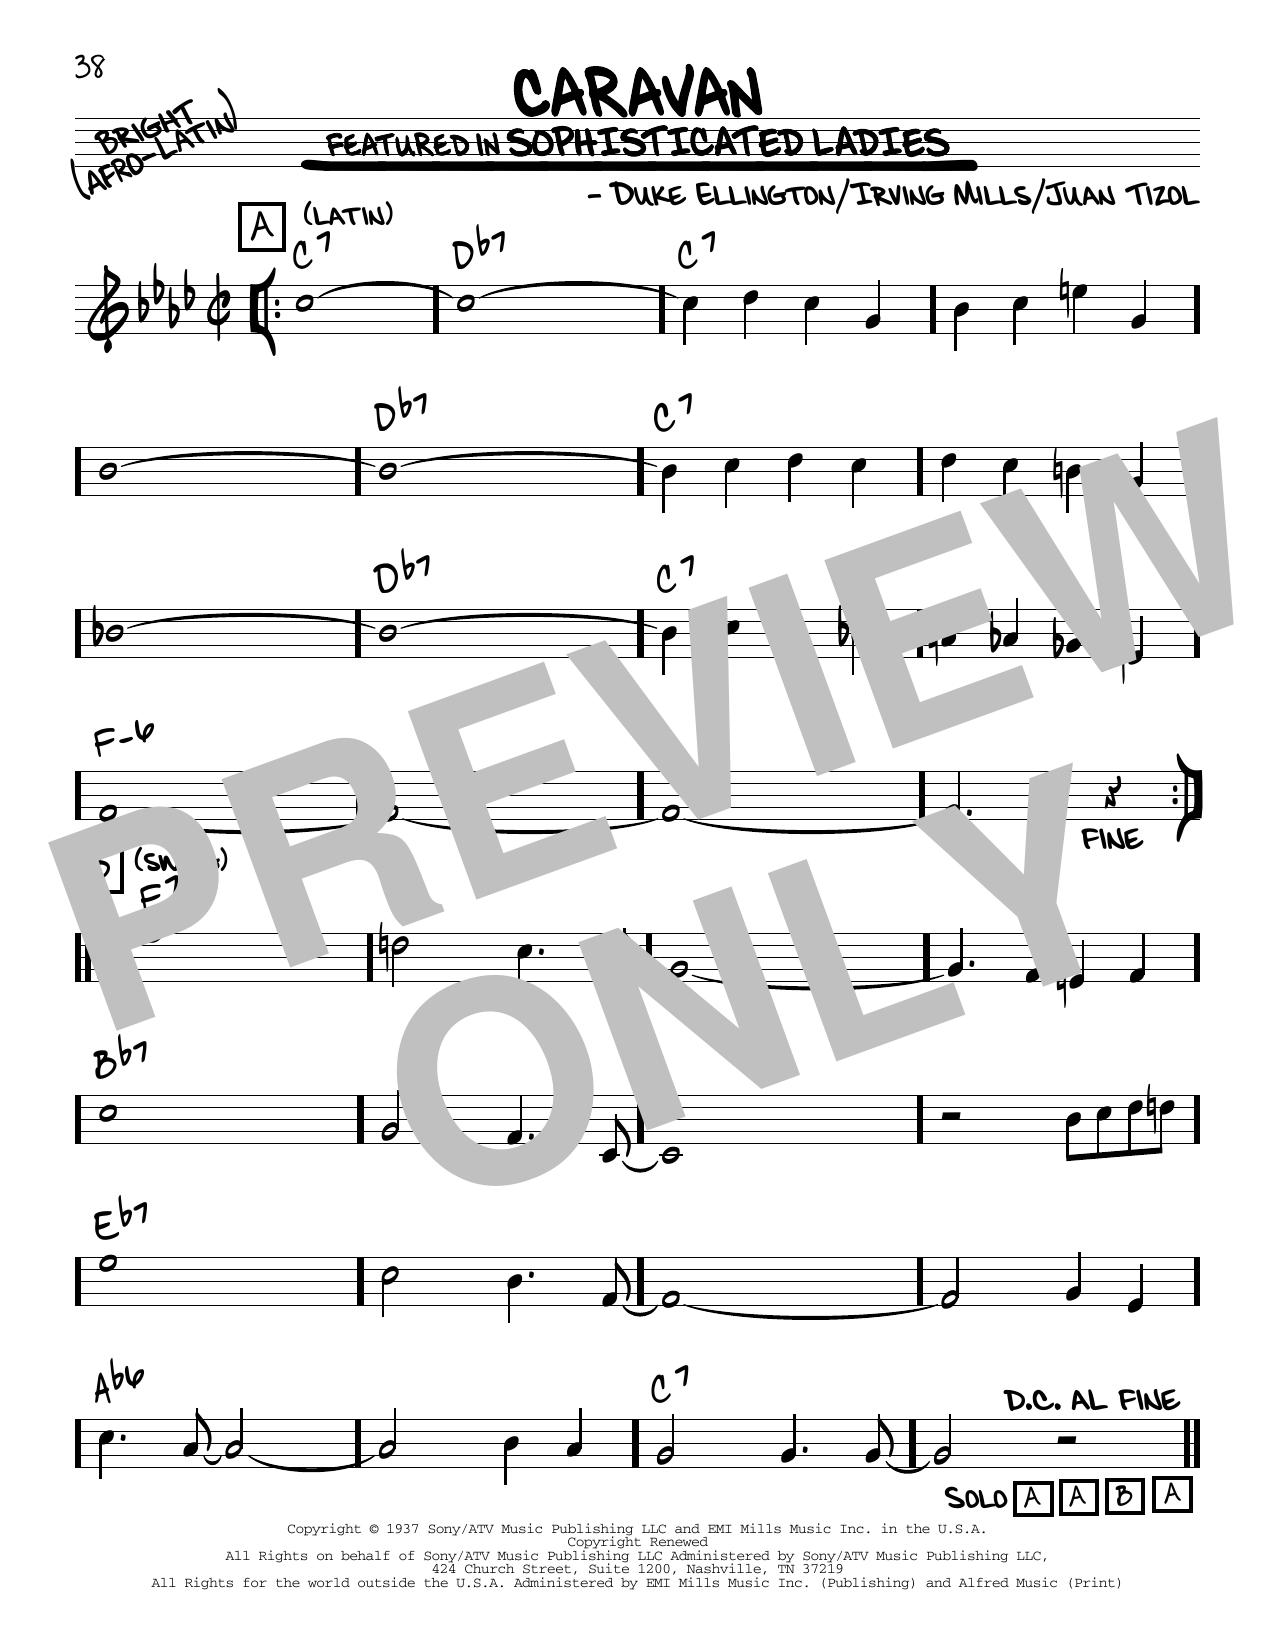 Caravan Other Sheet Music By Duke Ellington